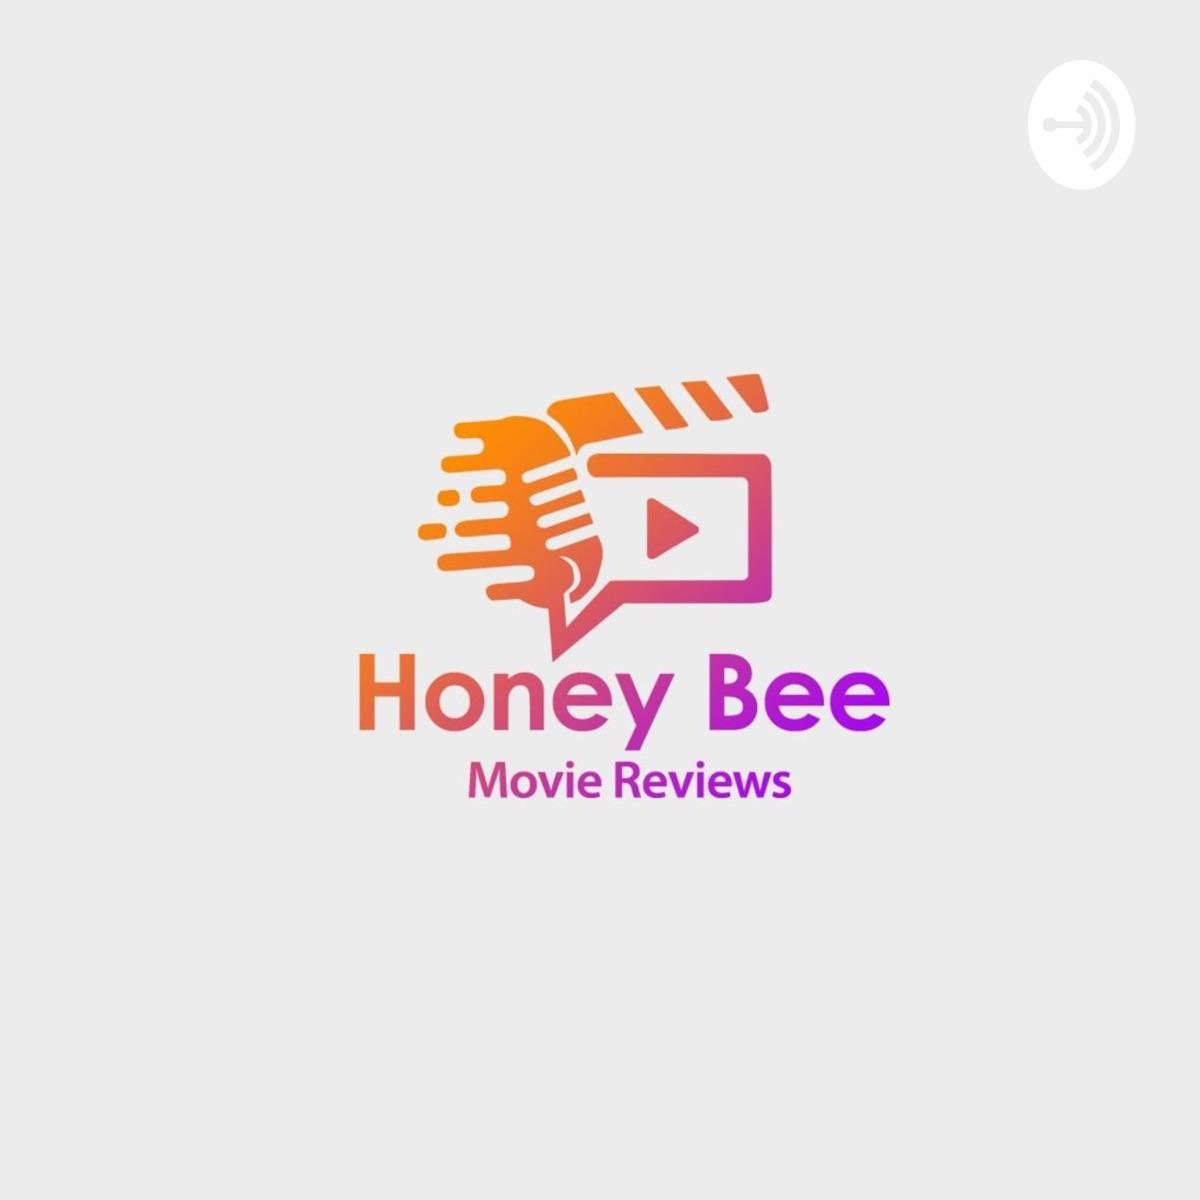 Honey bee movie reviews